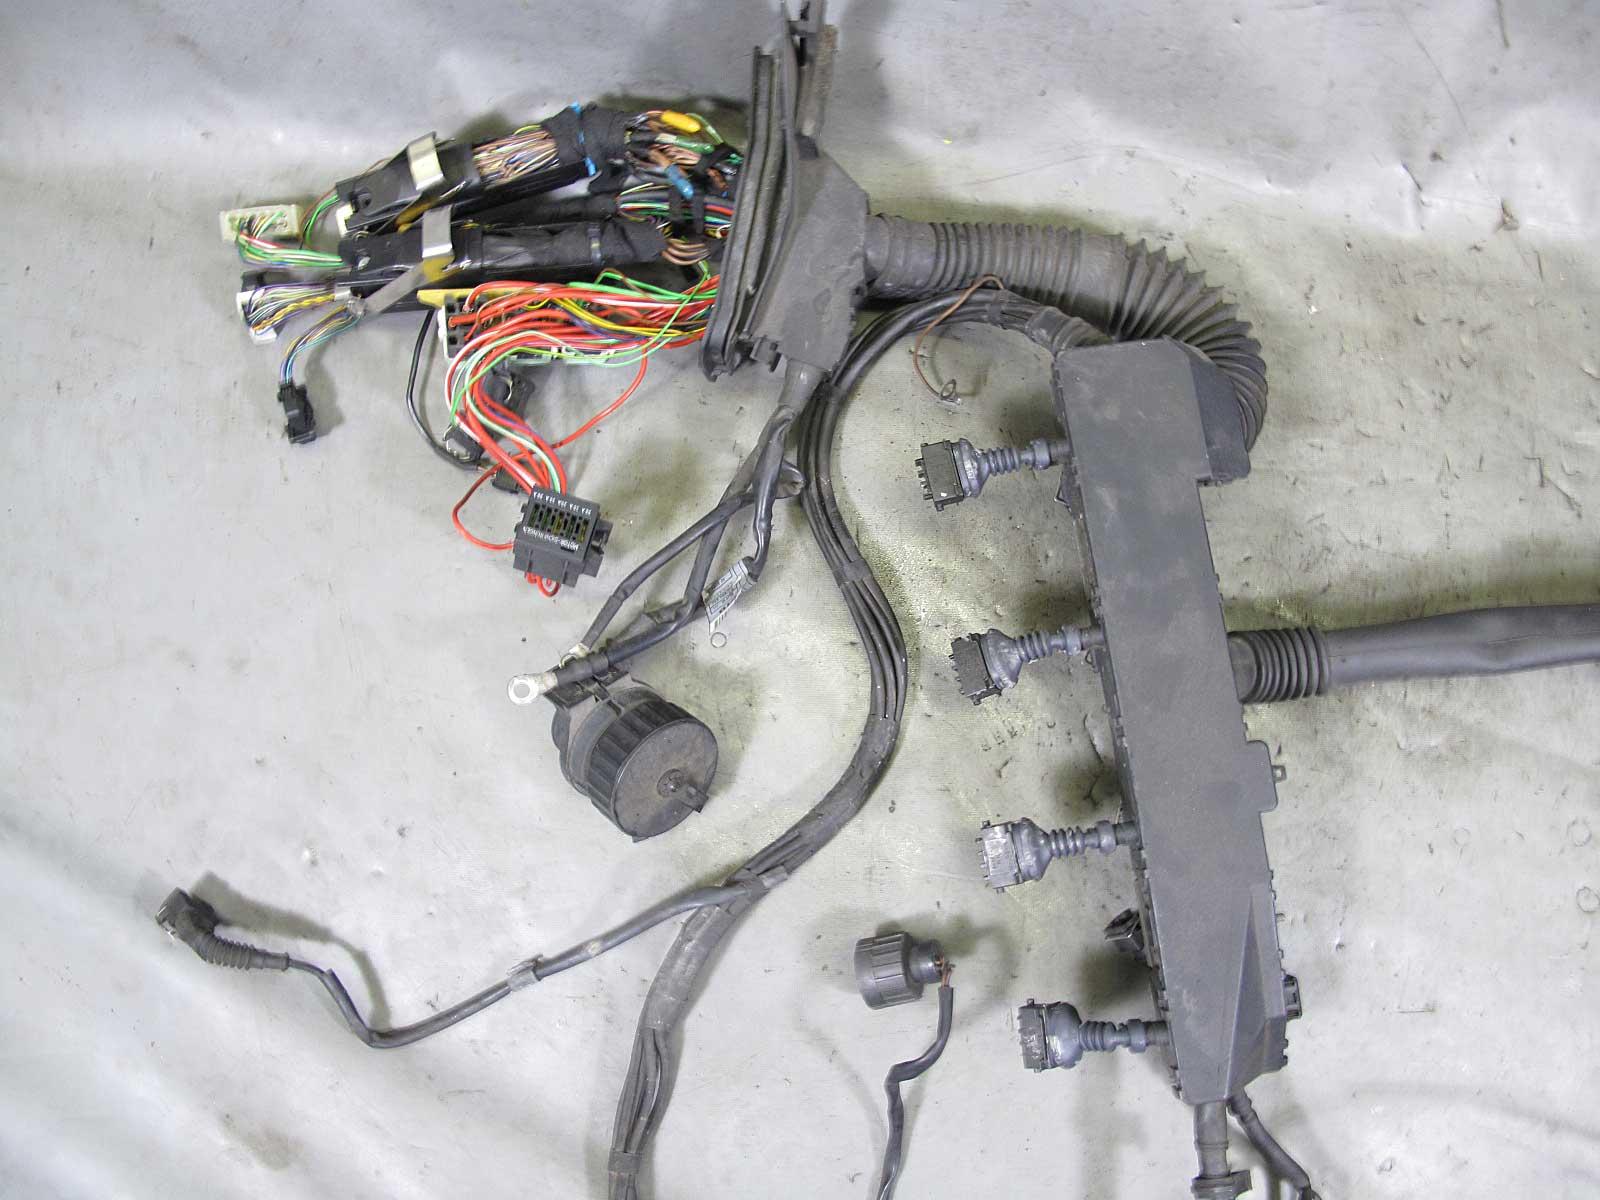 1996 1997 bmw e38 740i m62b44 v8 engine wiring harness complete used rh ebay com 1997 BMW 740iL 1998 BMW 740iL